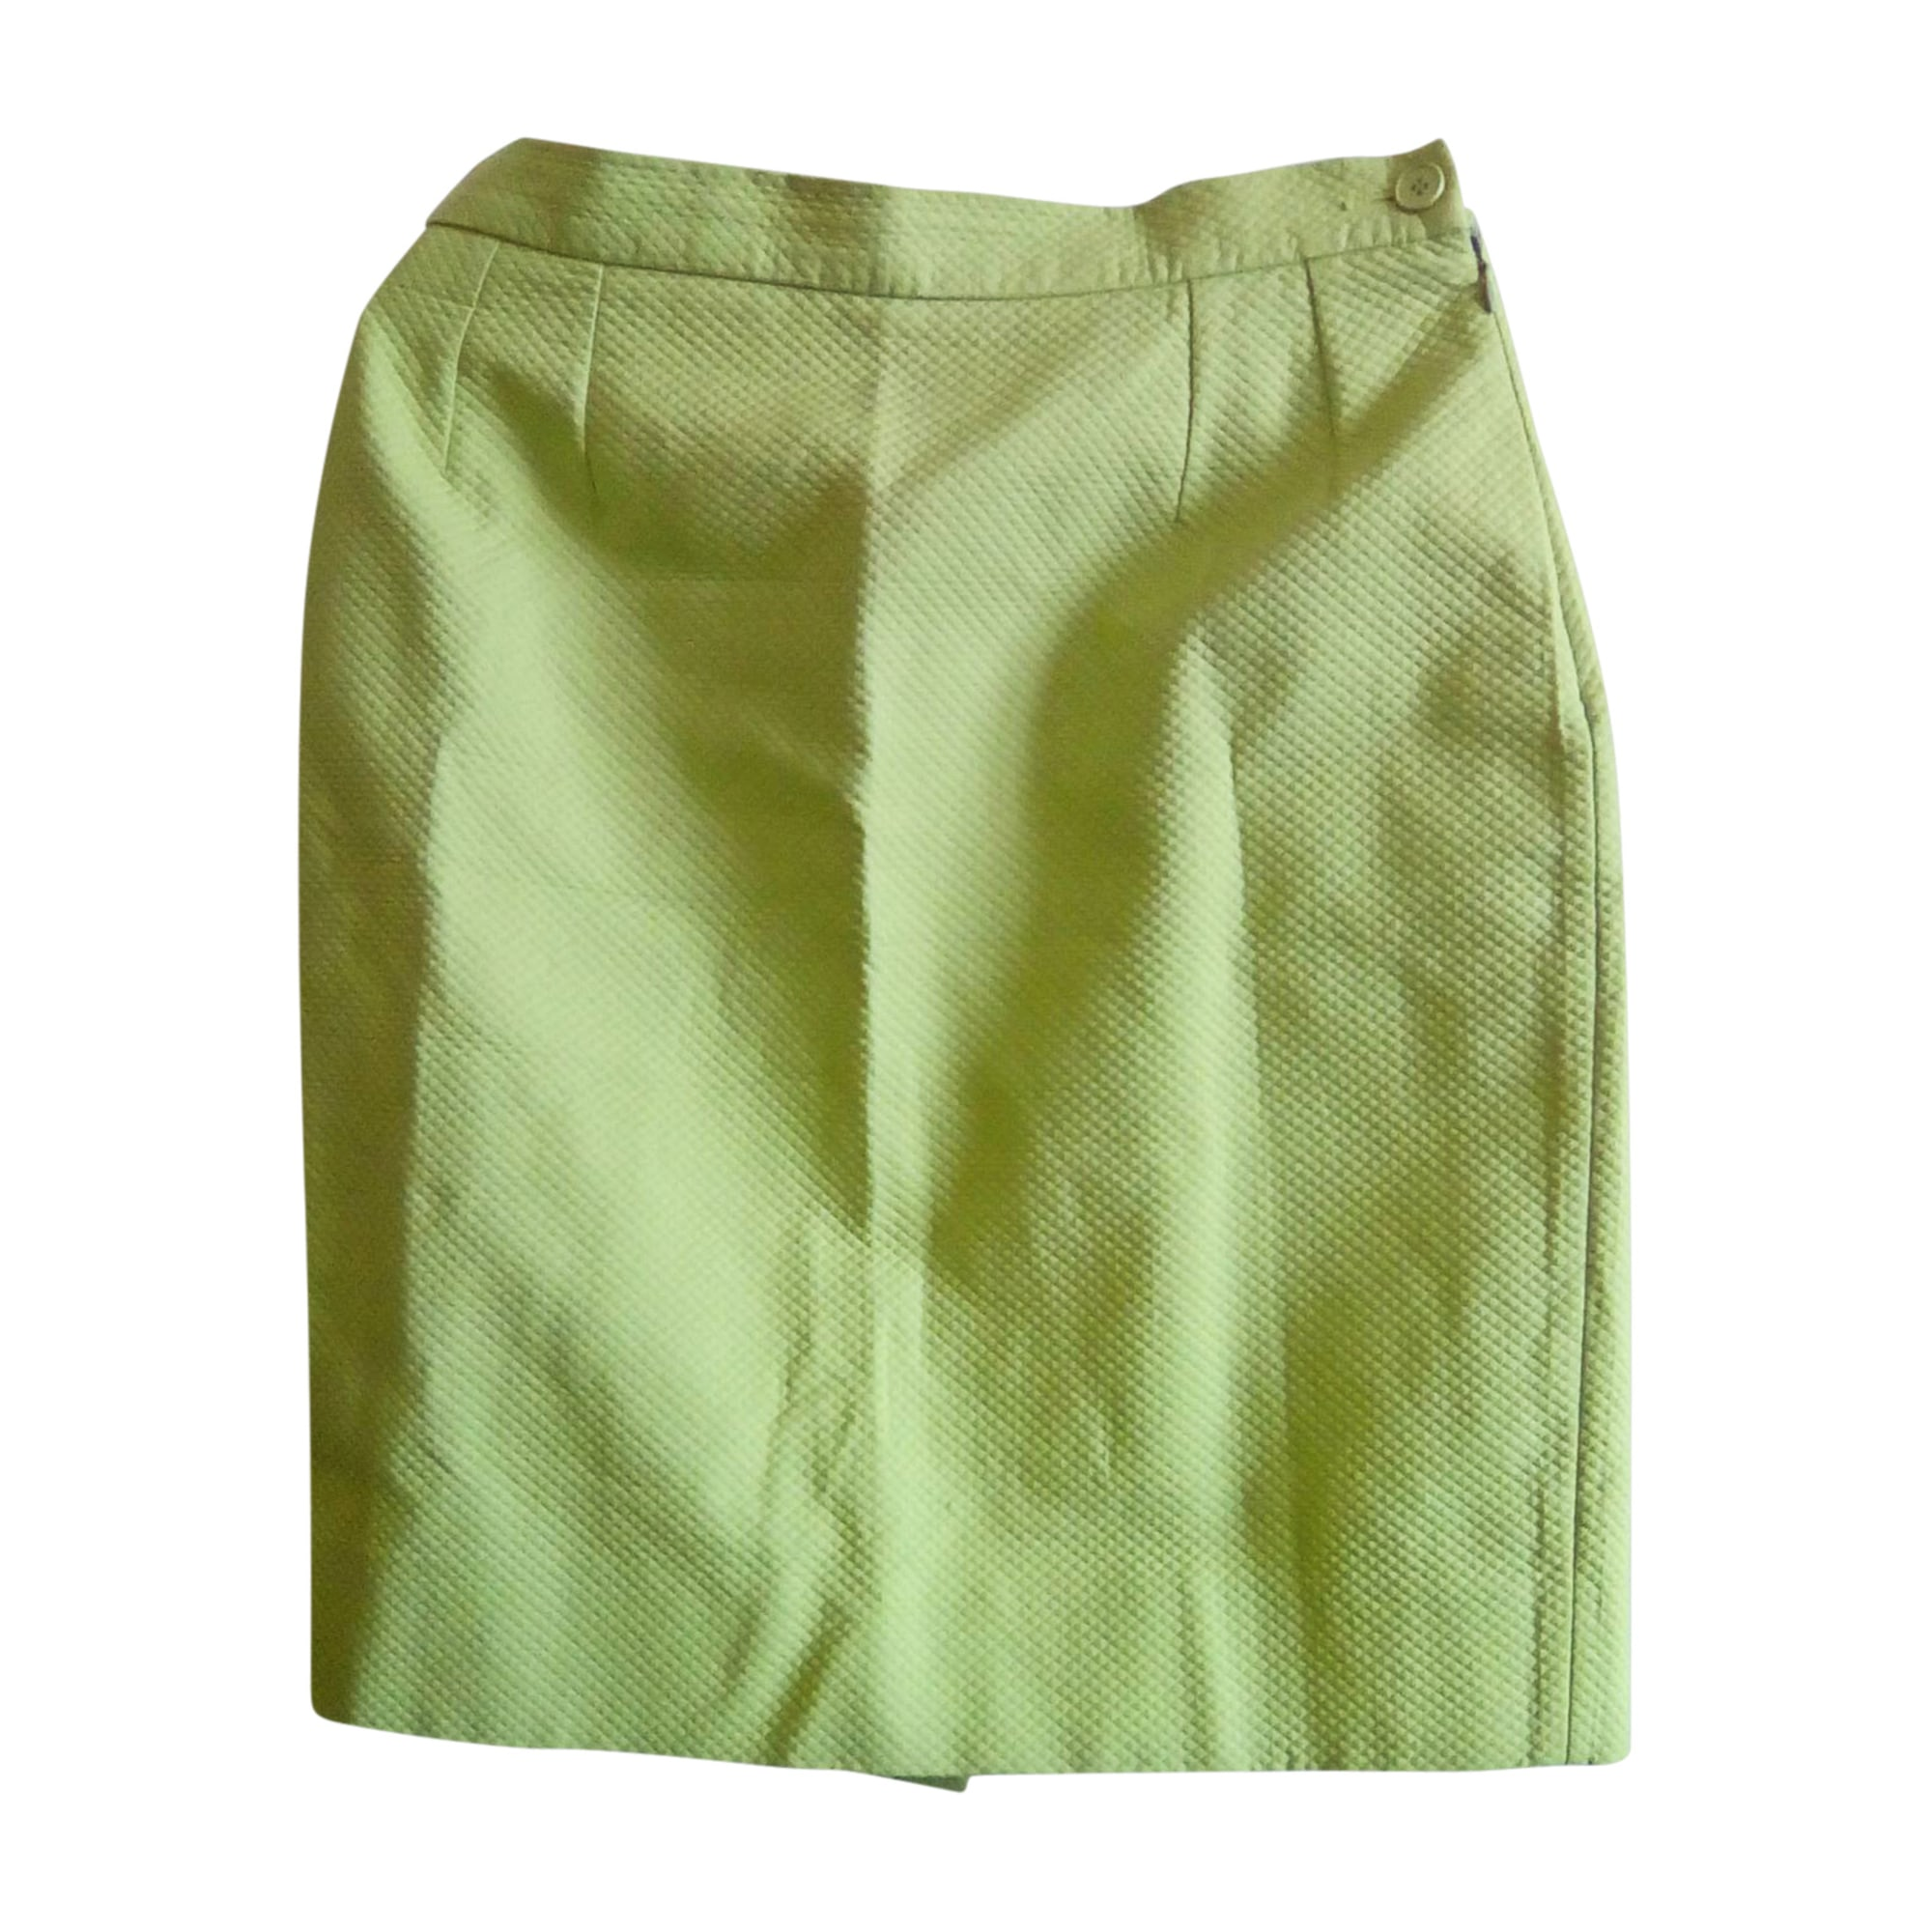 Tailleur jupe YVES SAINT LAURENT Vert